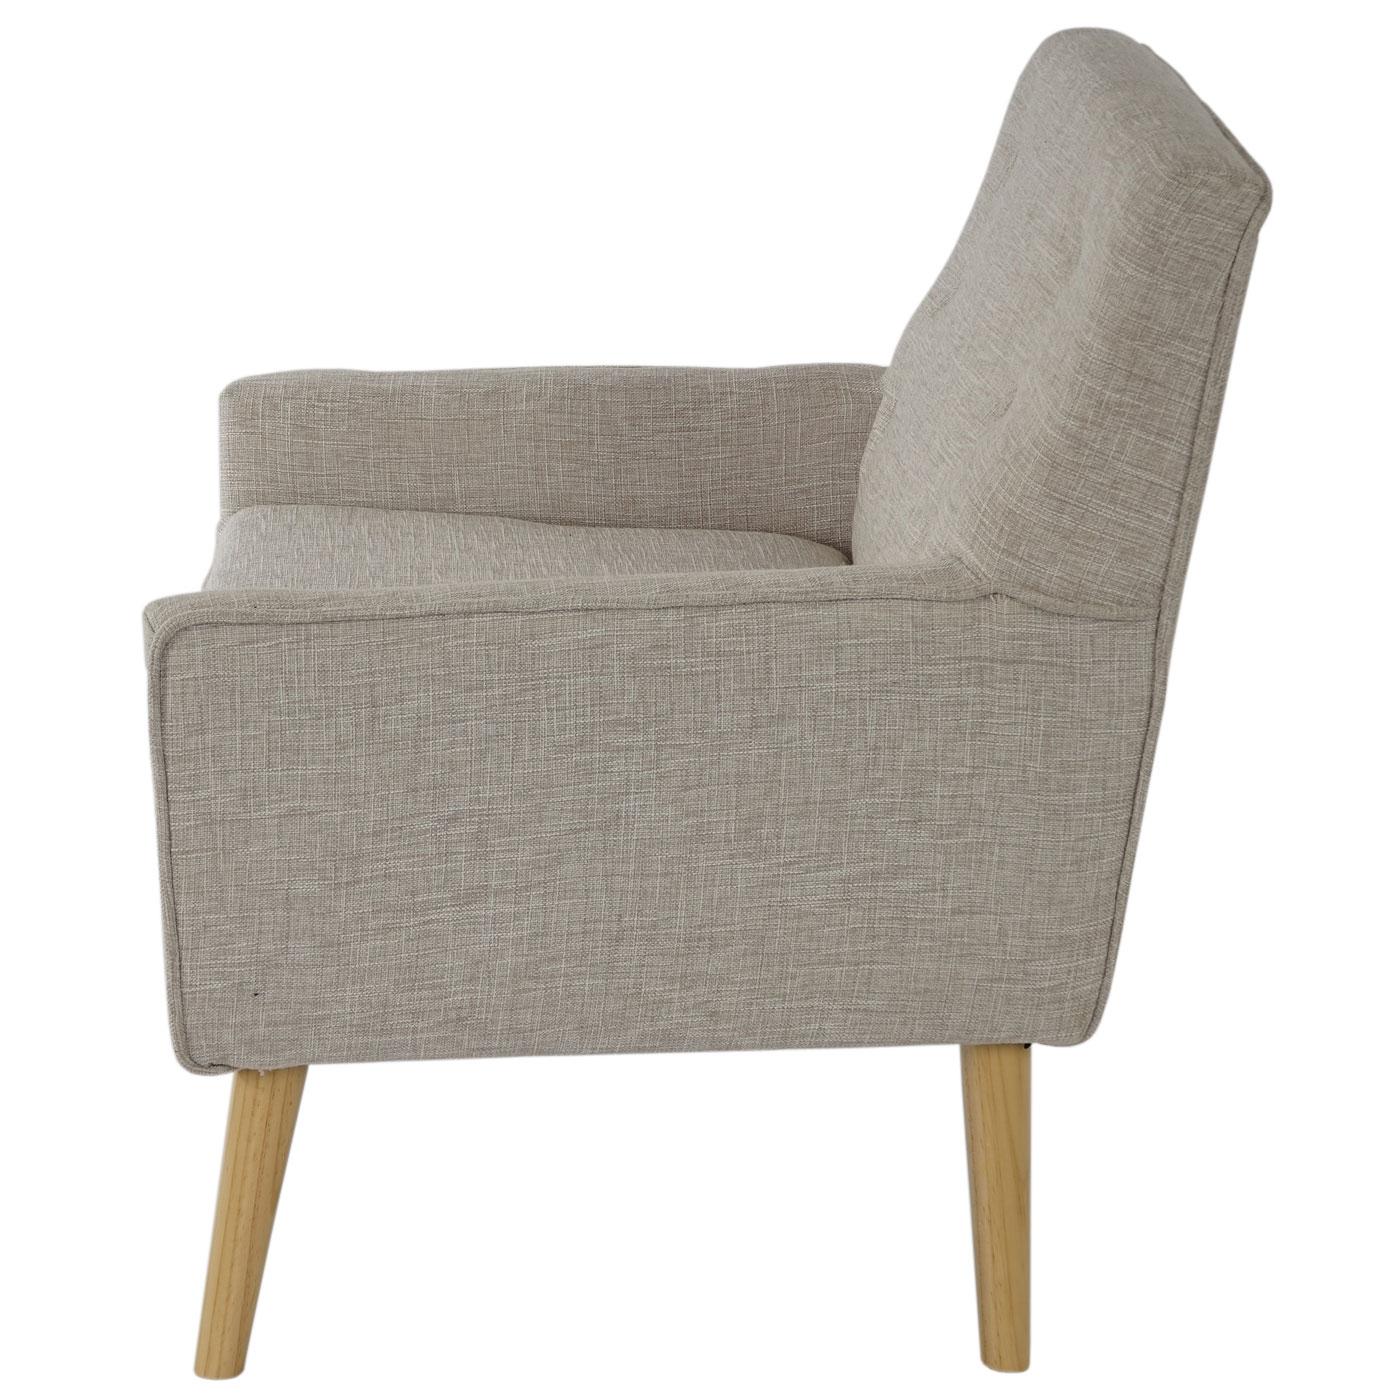 sessel malm t370 loungesessel polstersessel retro 50er. Black Bedroom Furniture Sets. Home Design Ideas